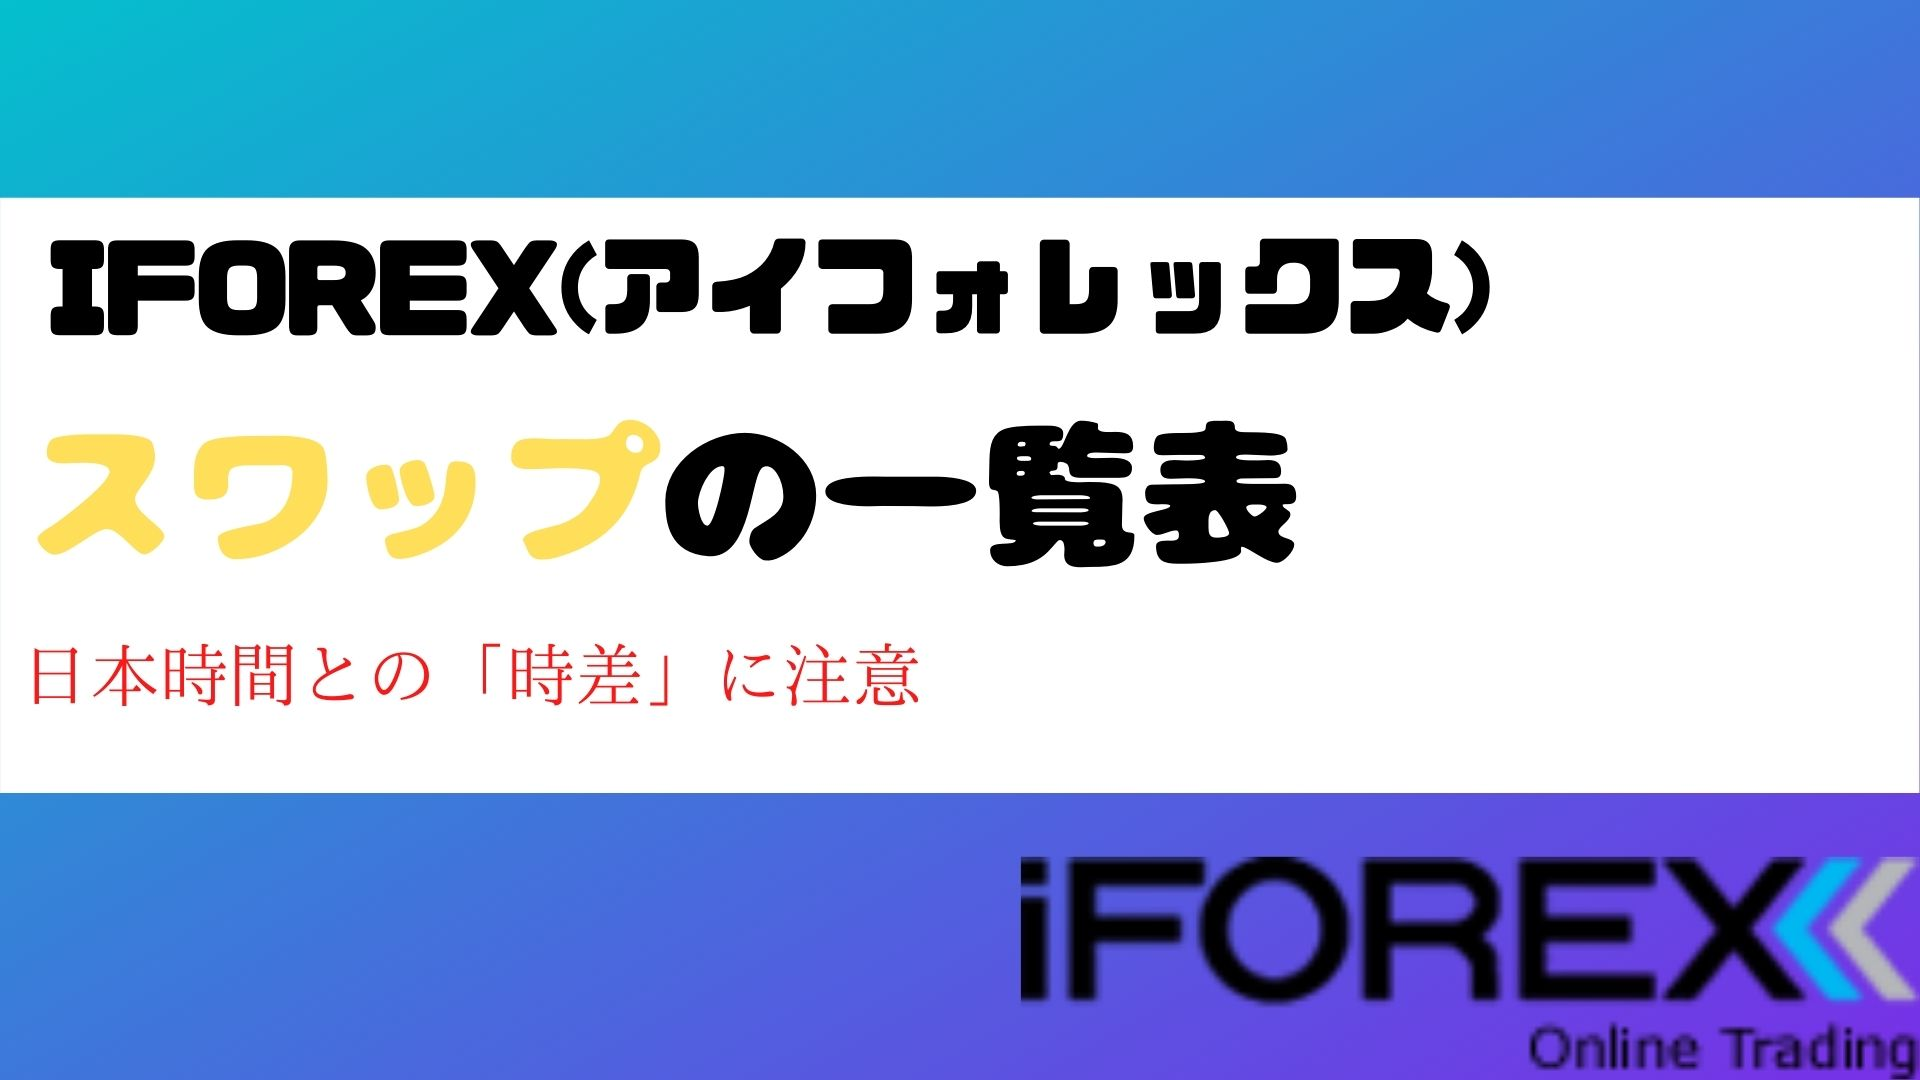 iforex-swap-title